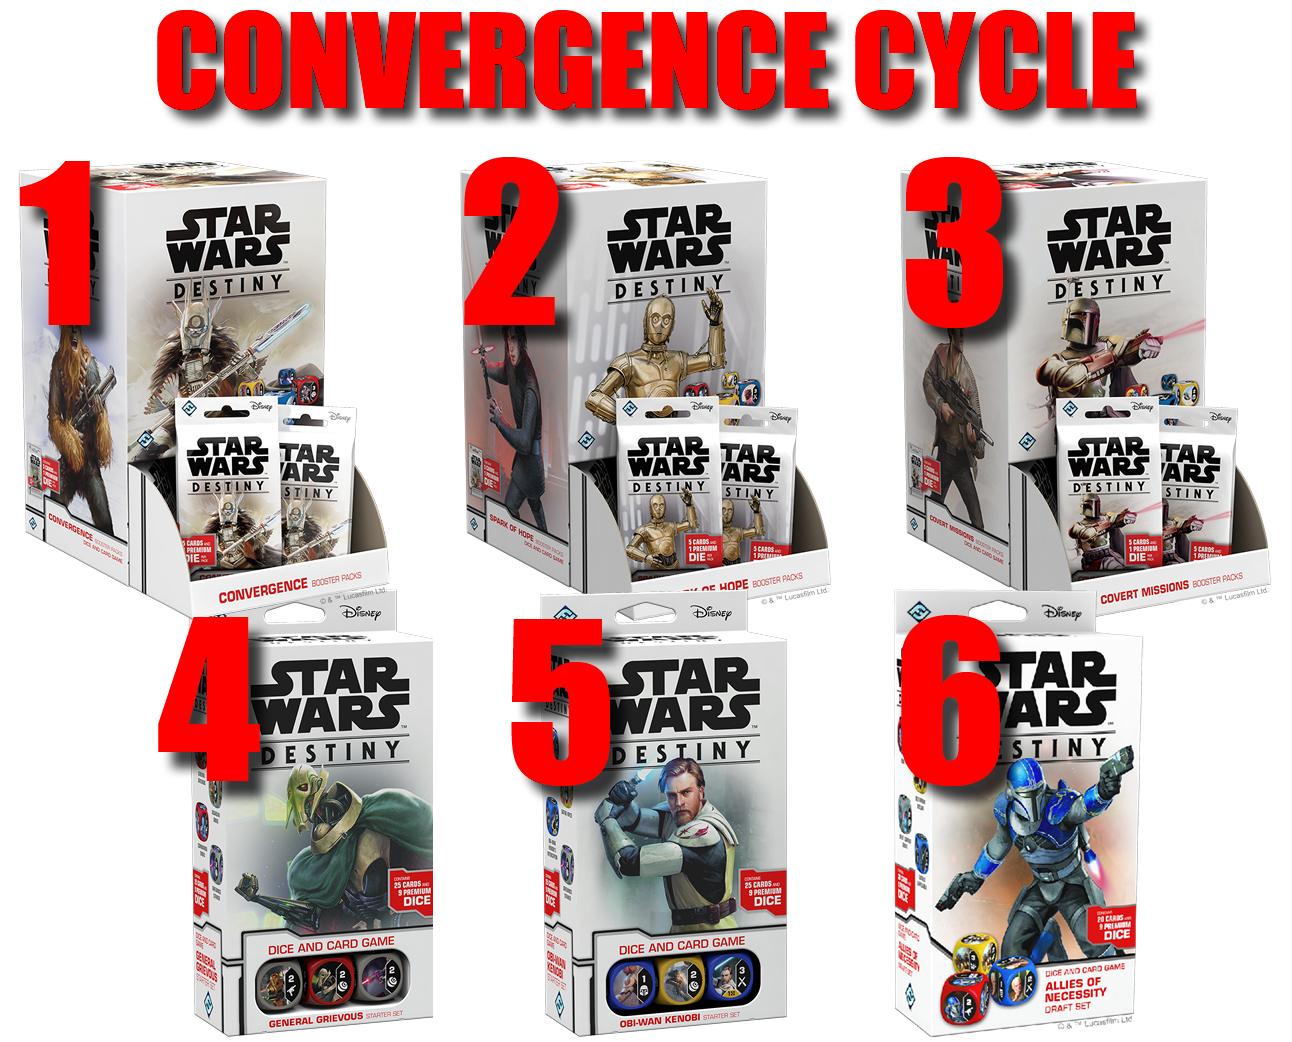 Convergence Cyclejpg